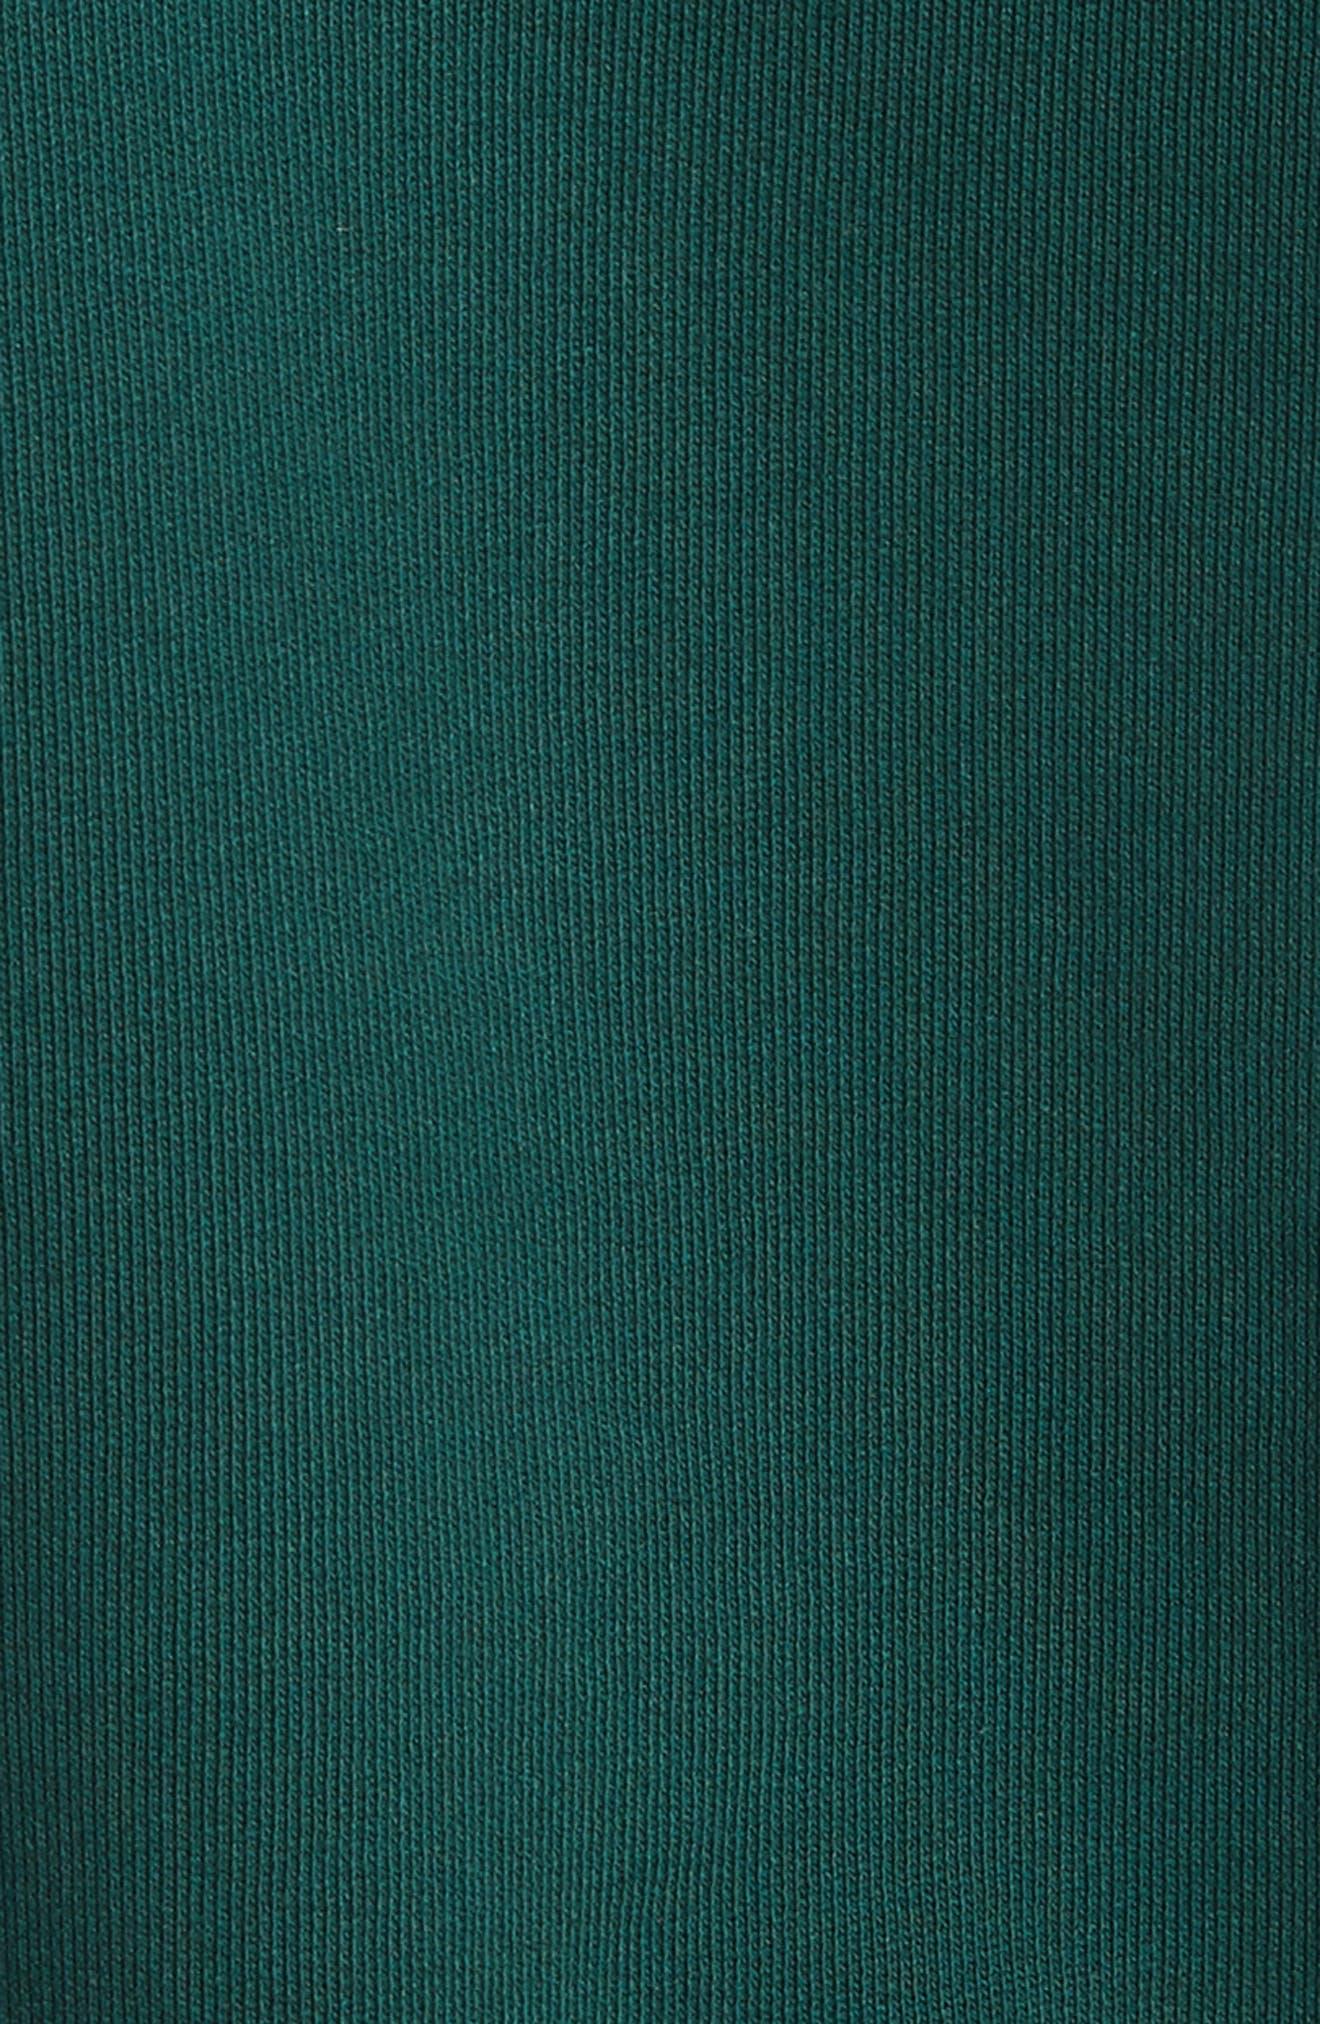 Airlines Crop Crewneck Sweatshirt,                             Alternate thumbnail 5, color,                             300